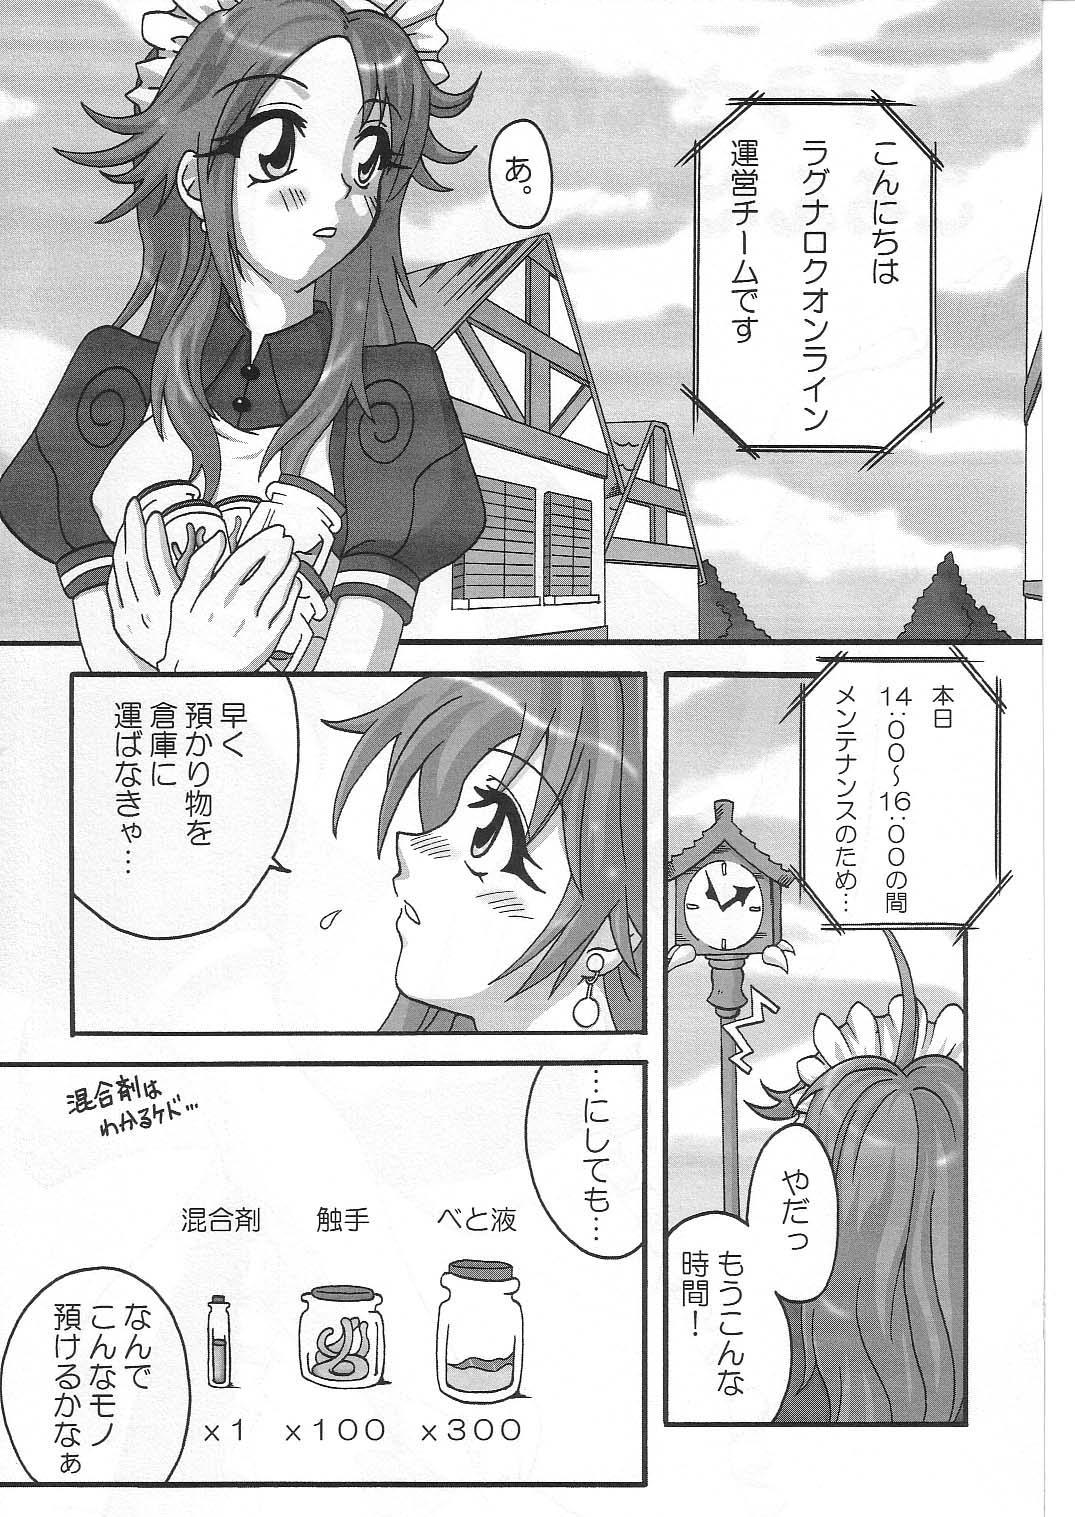 Kapura-san ga Koronda 5